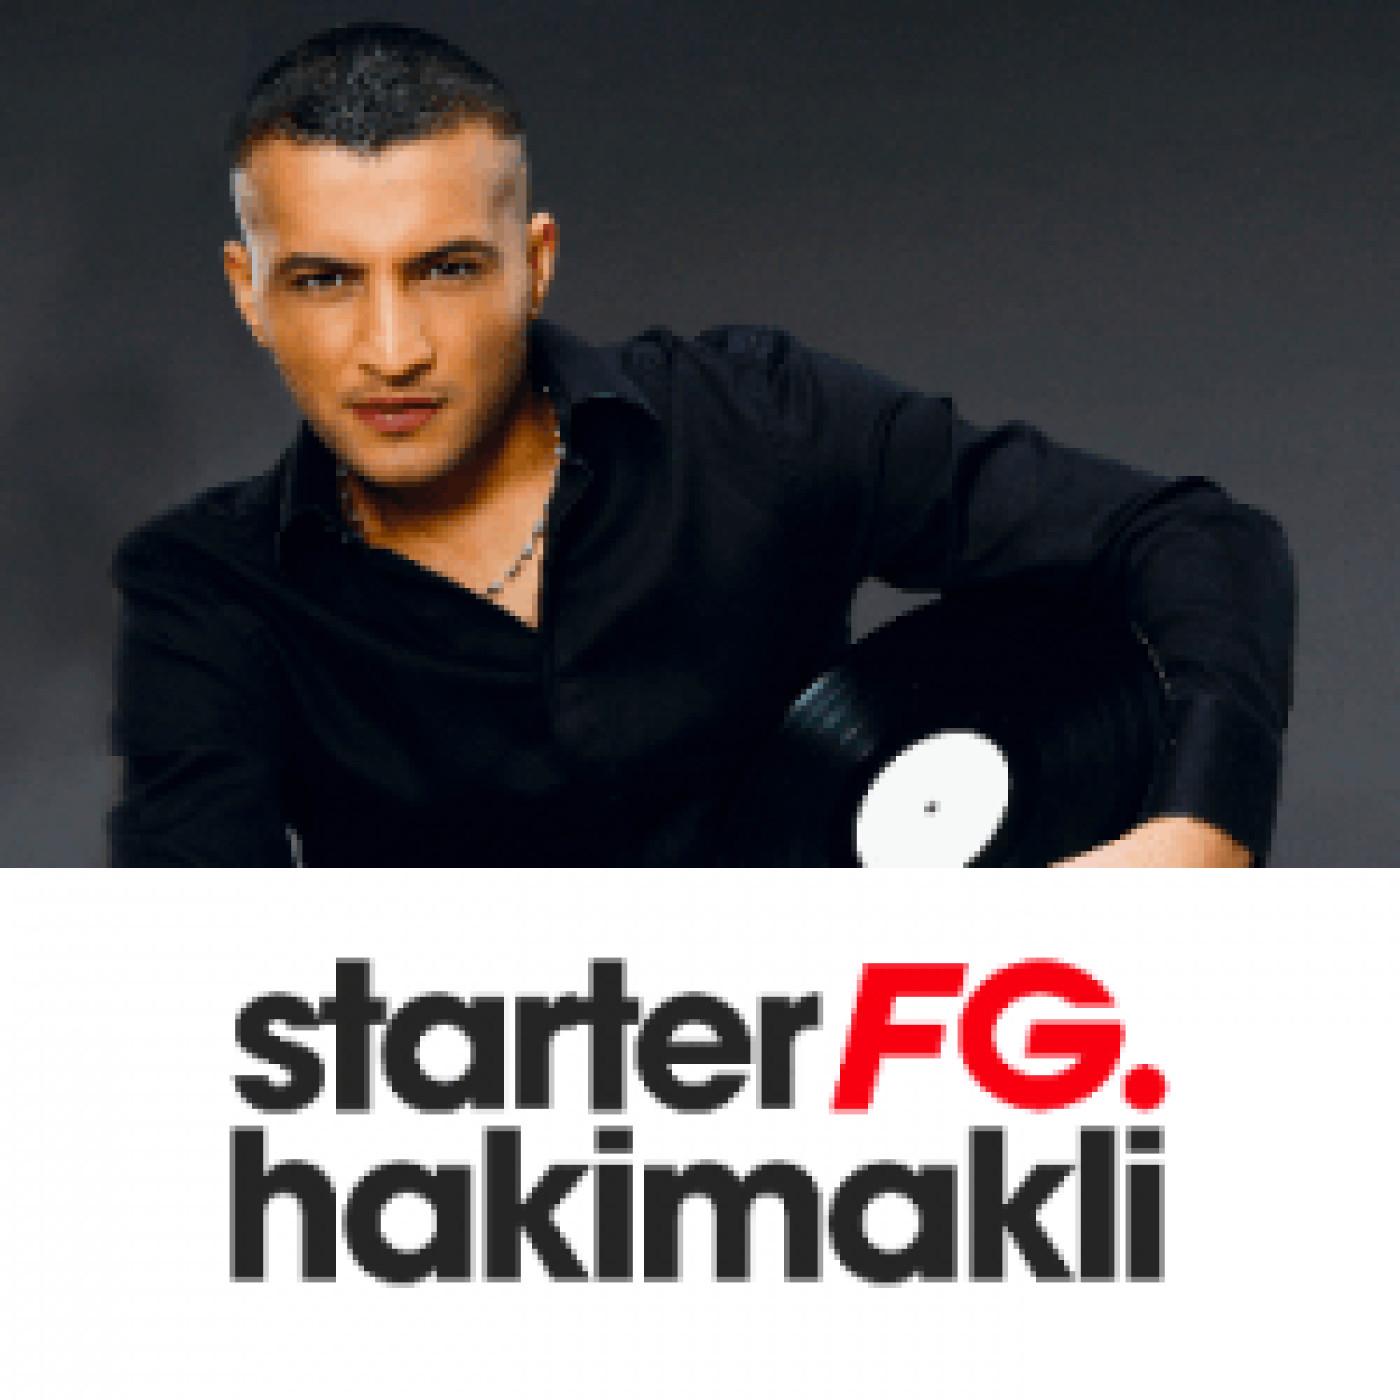 STARTER FG BY HAKIMAKLI MERCREDI 2 SEPTEMBRE 2020